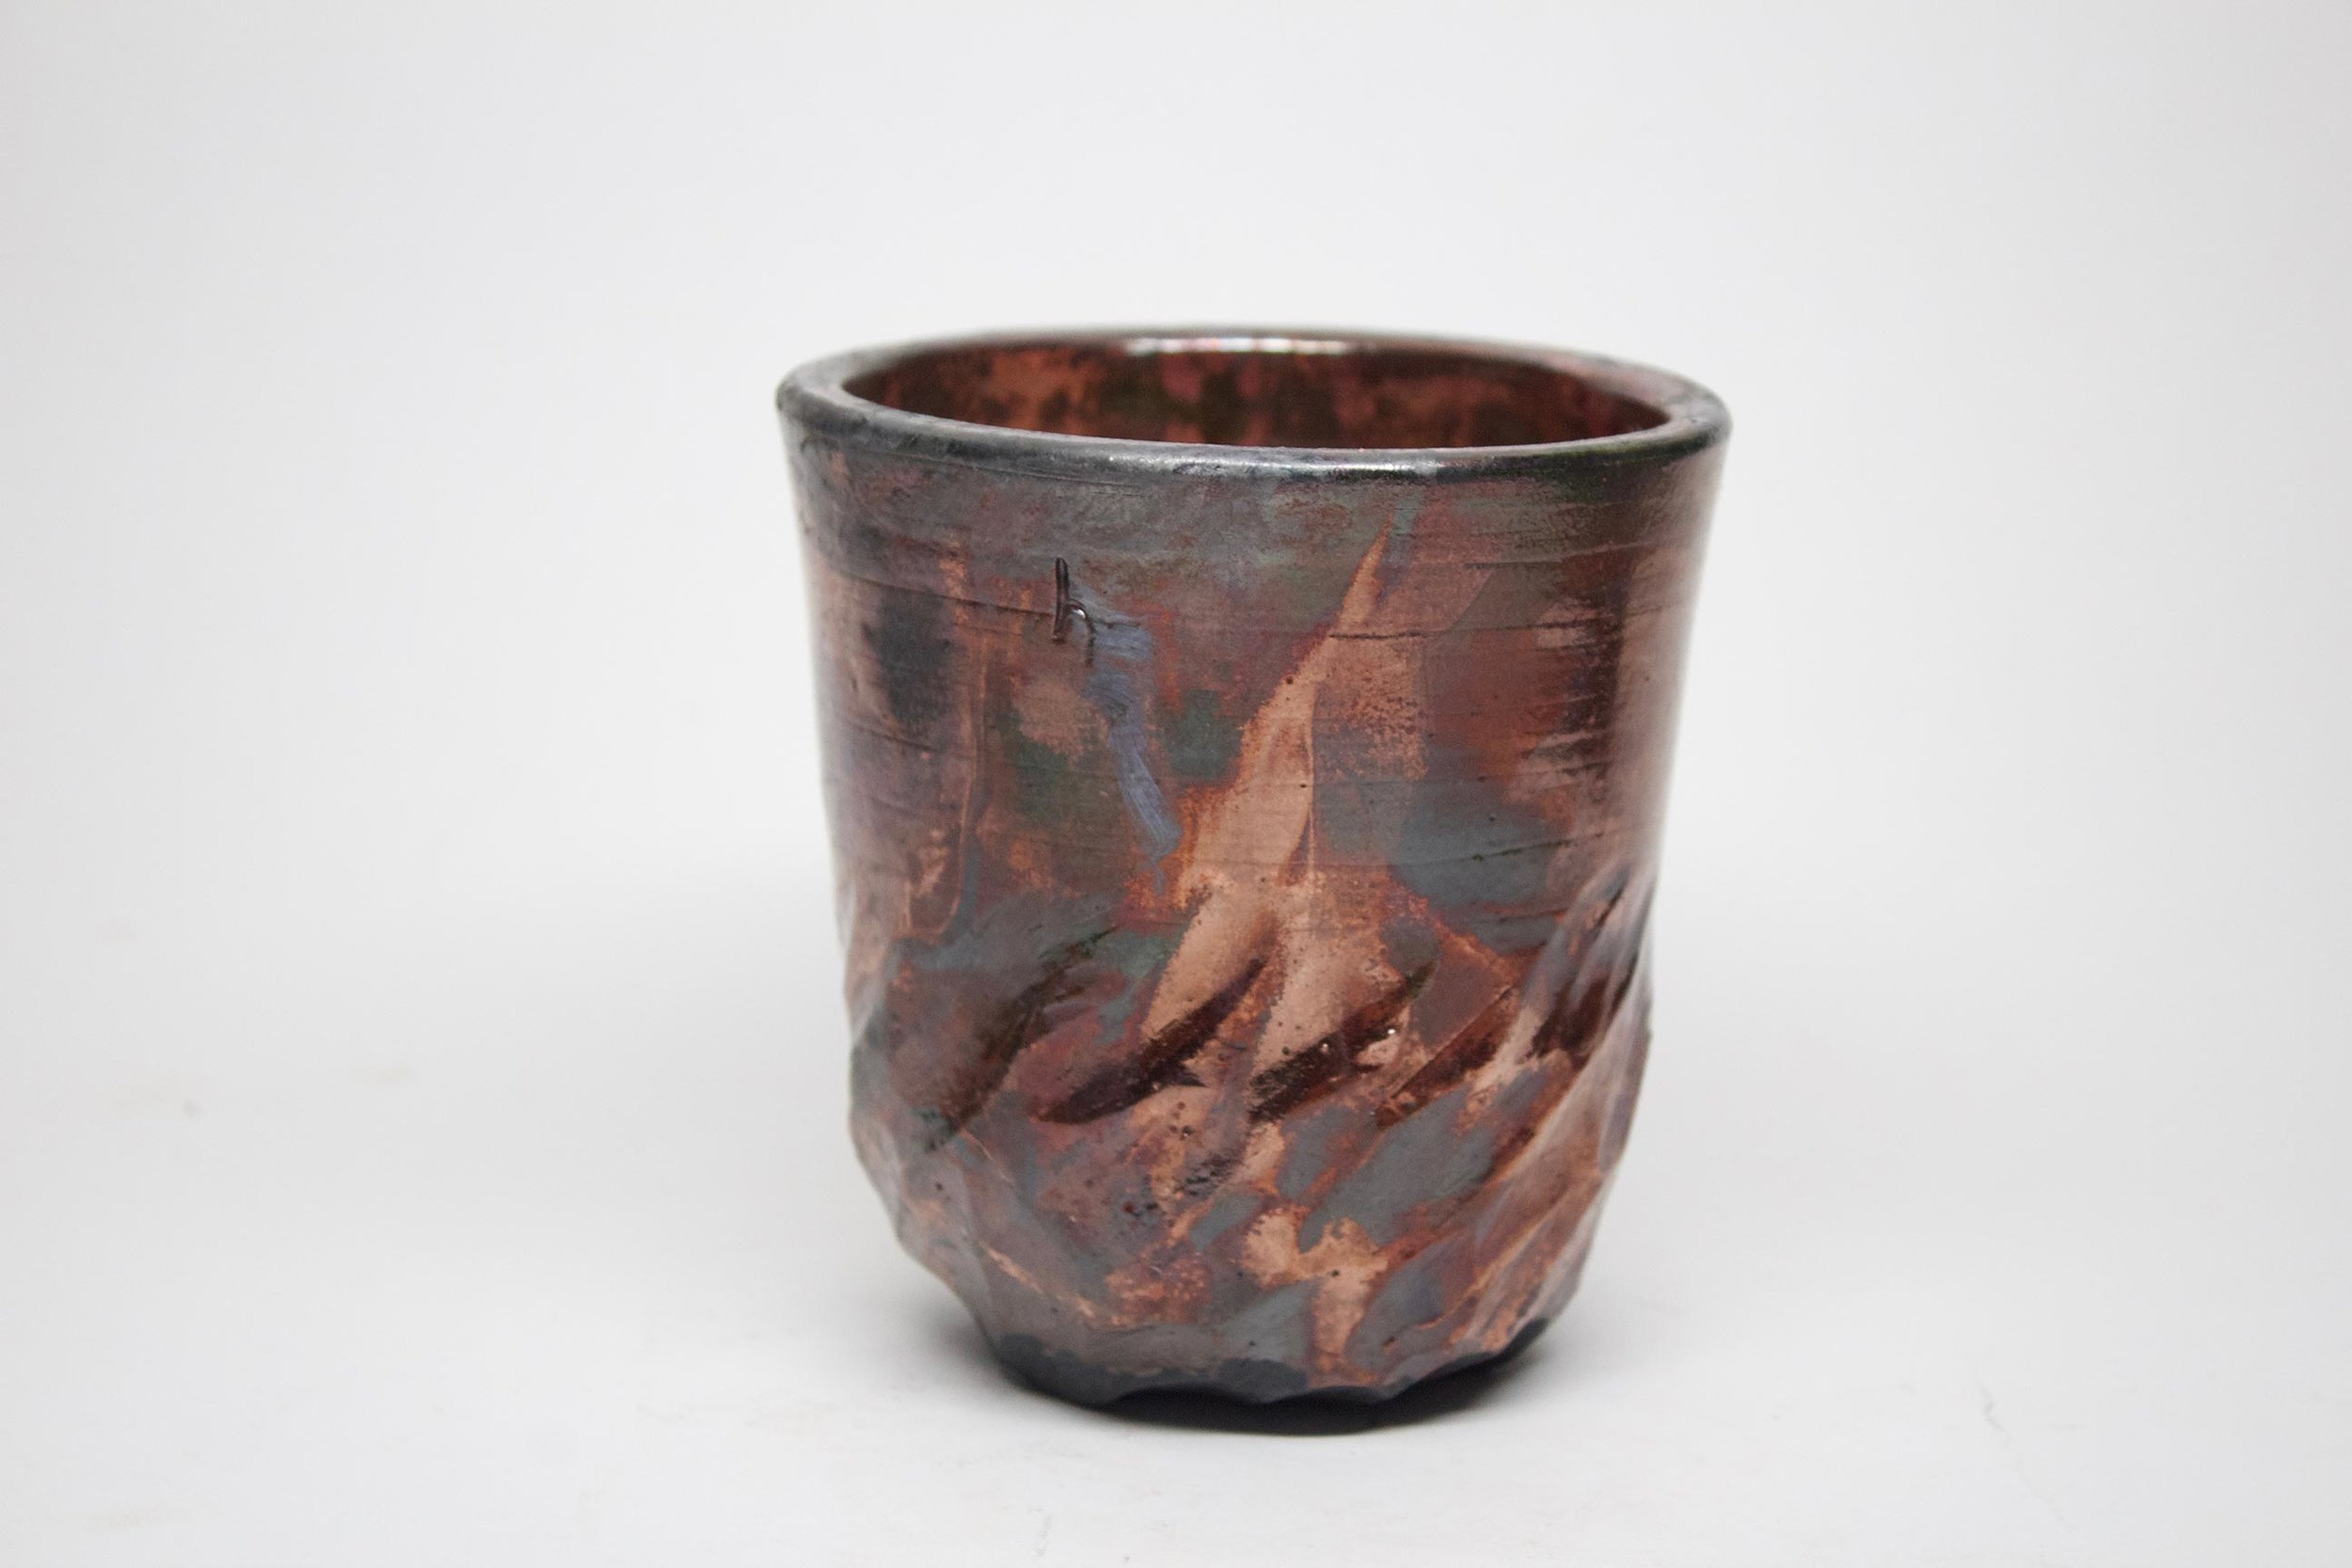 Horn_Copper Vase_RakuedStoneware_7inches tall.jpg